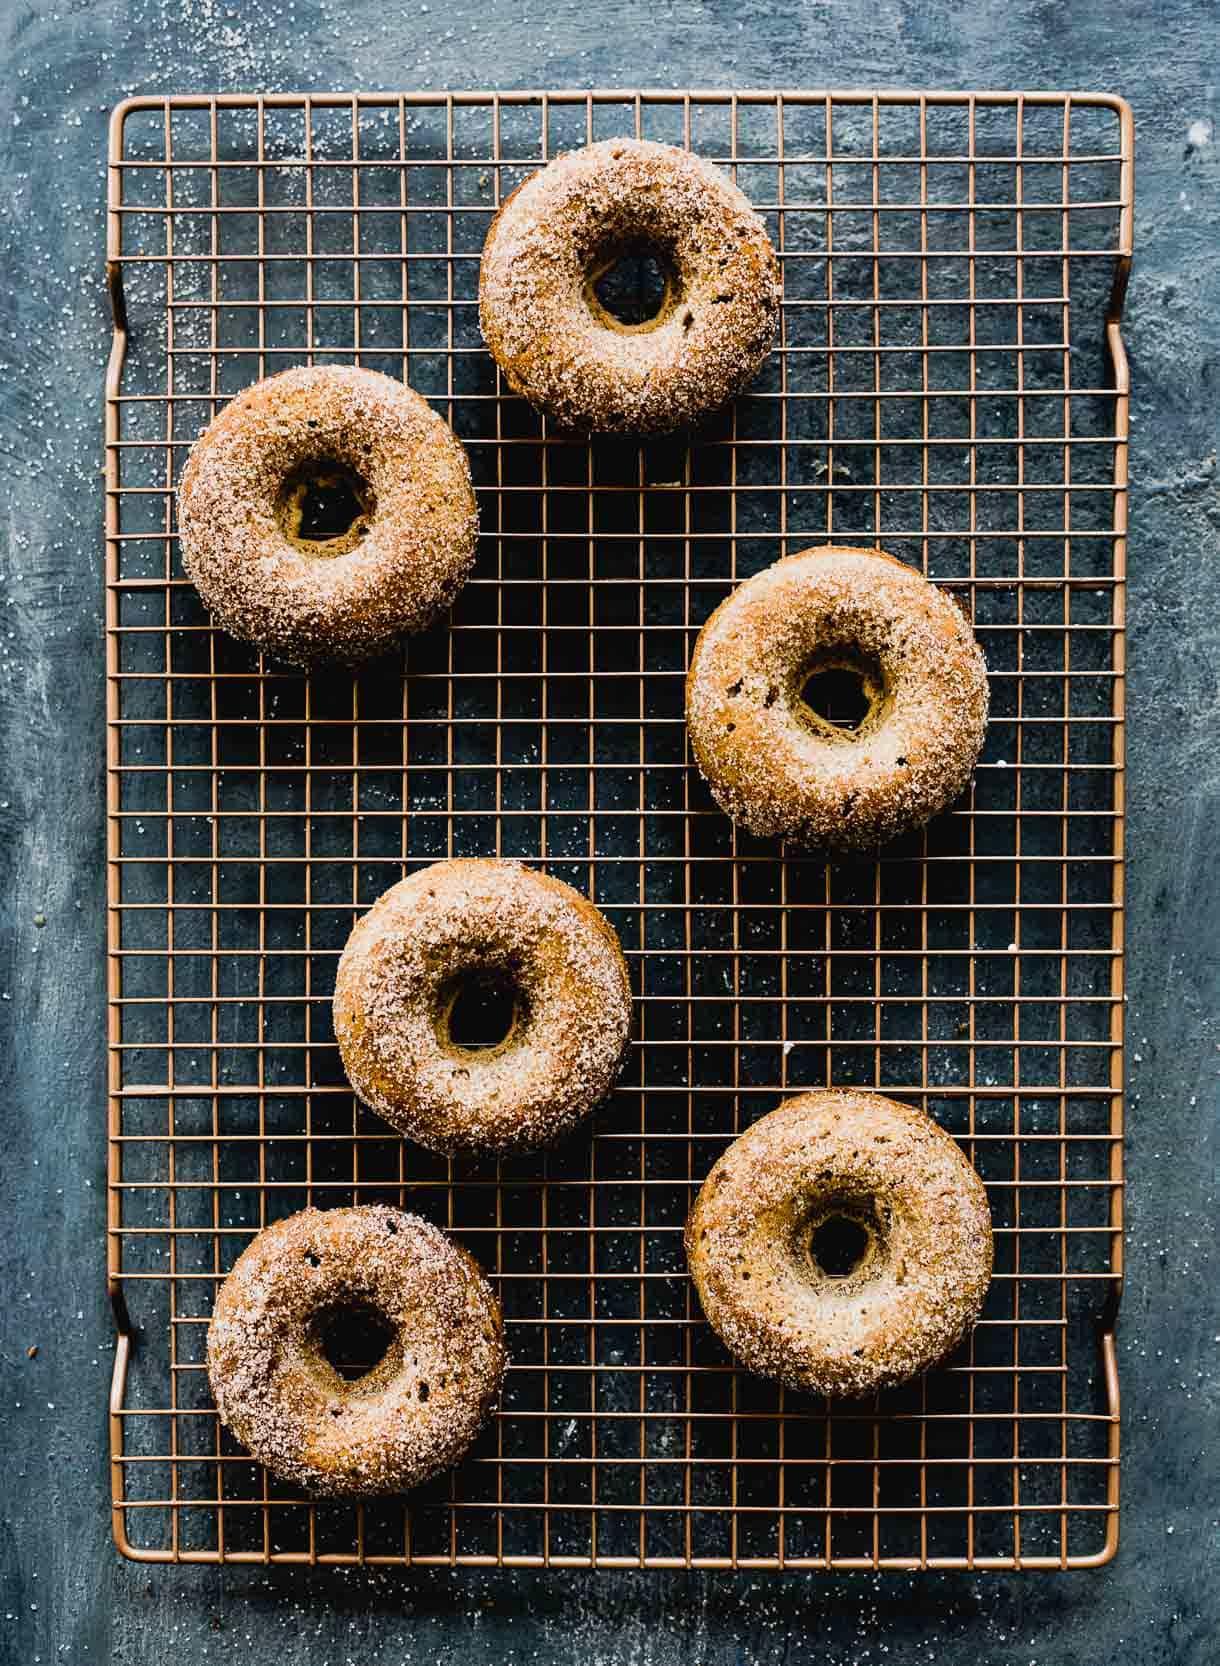 Baked Gluten-Free Pumpkin Spice Donuts